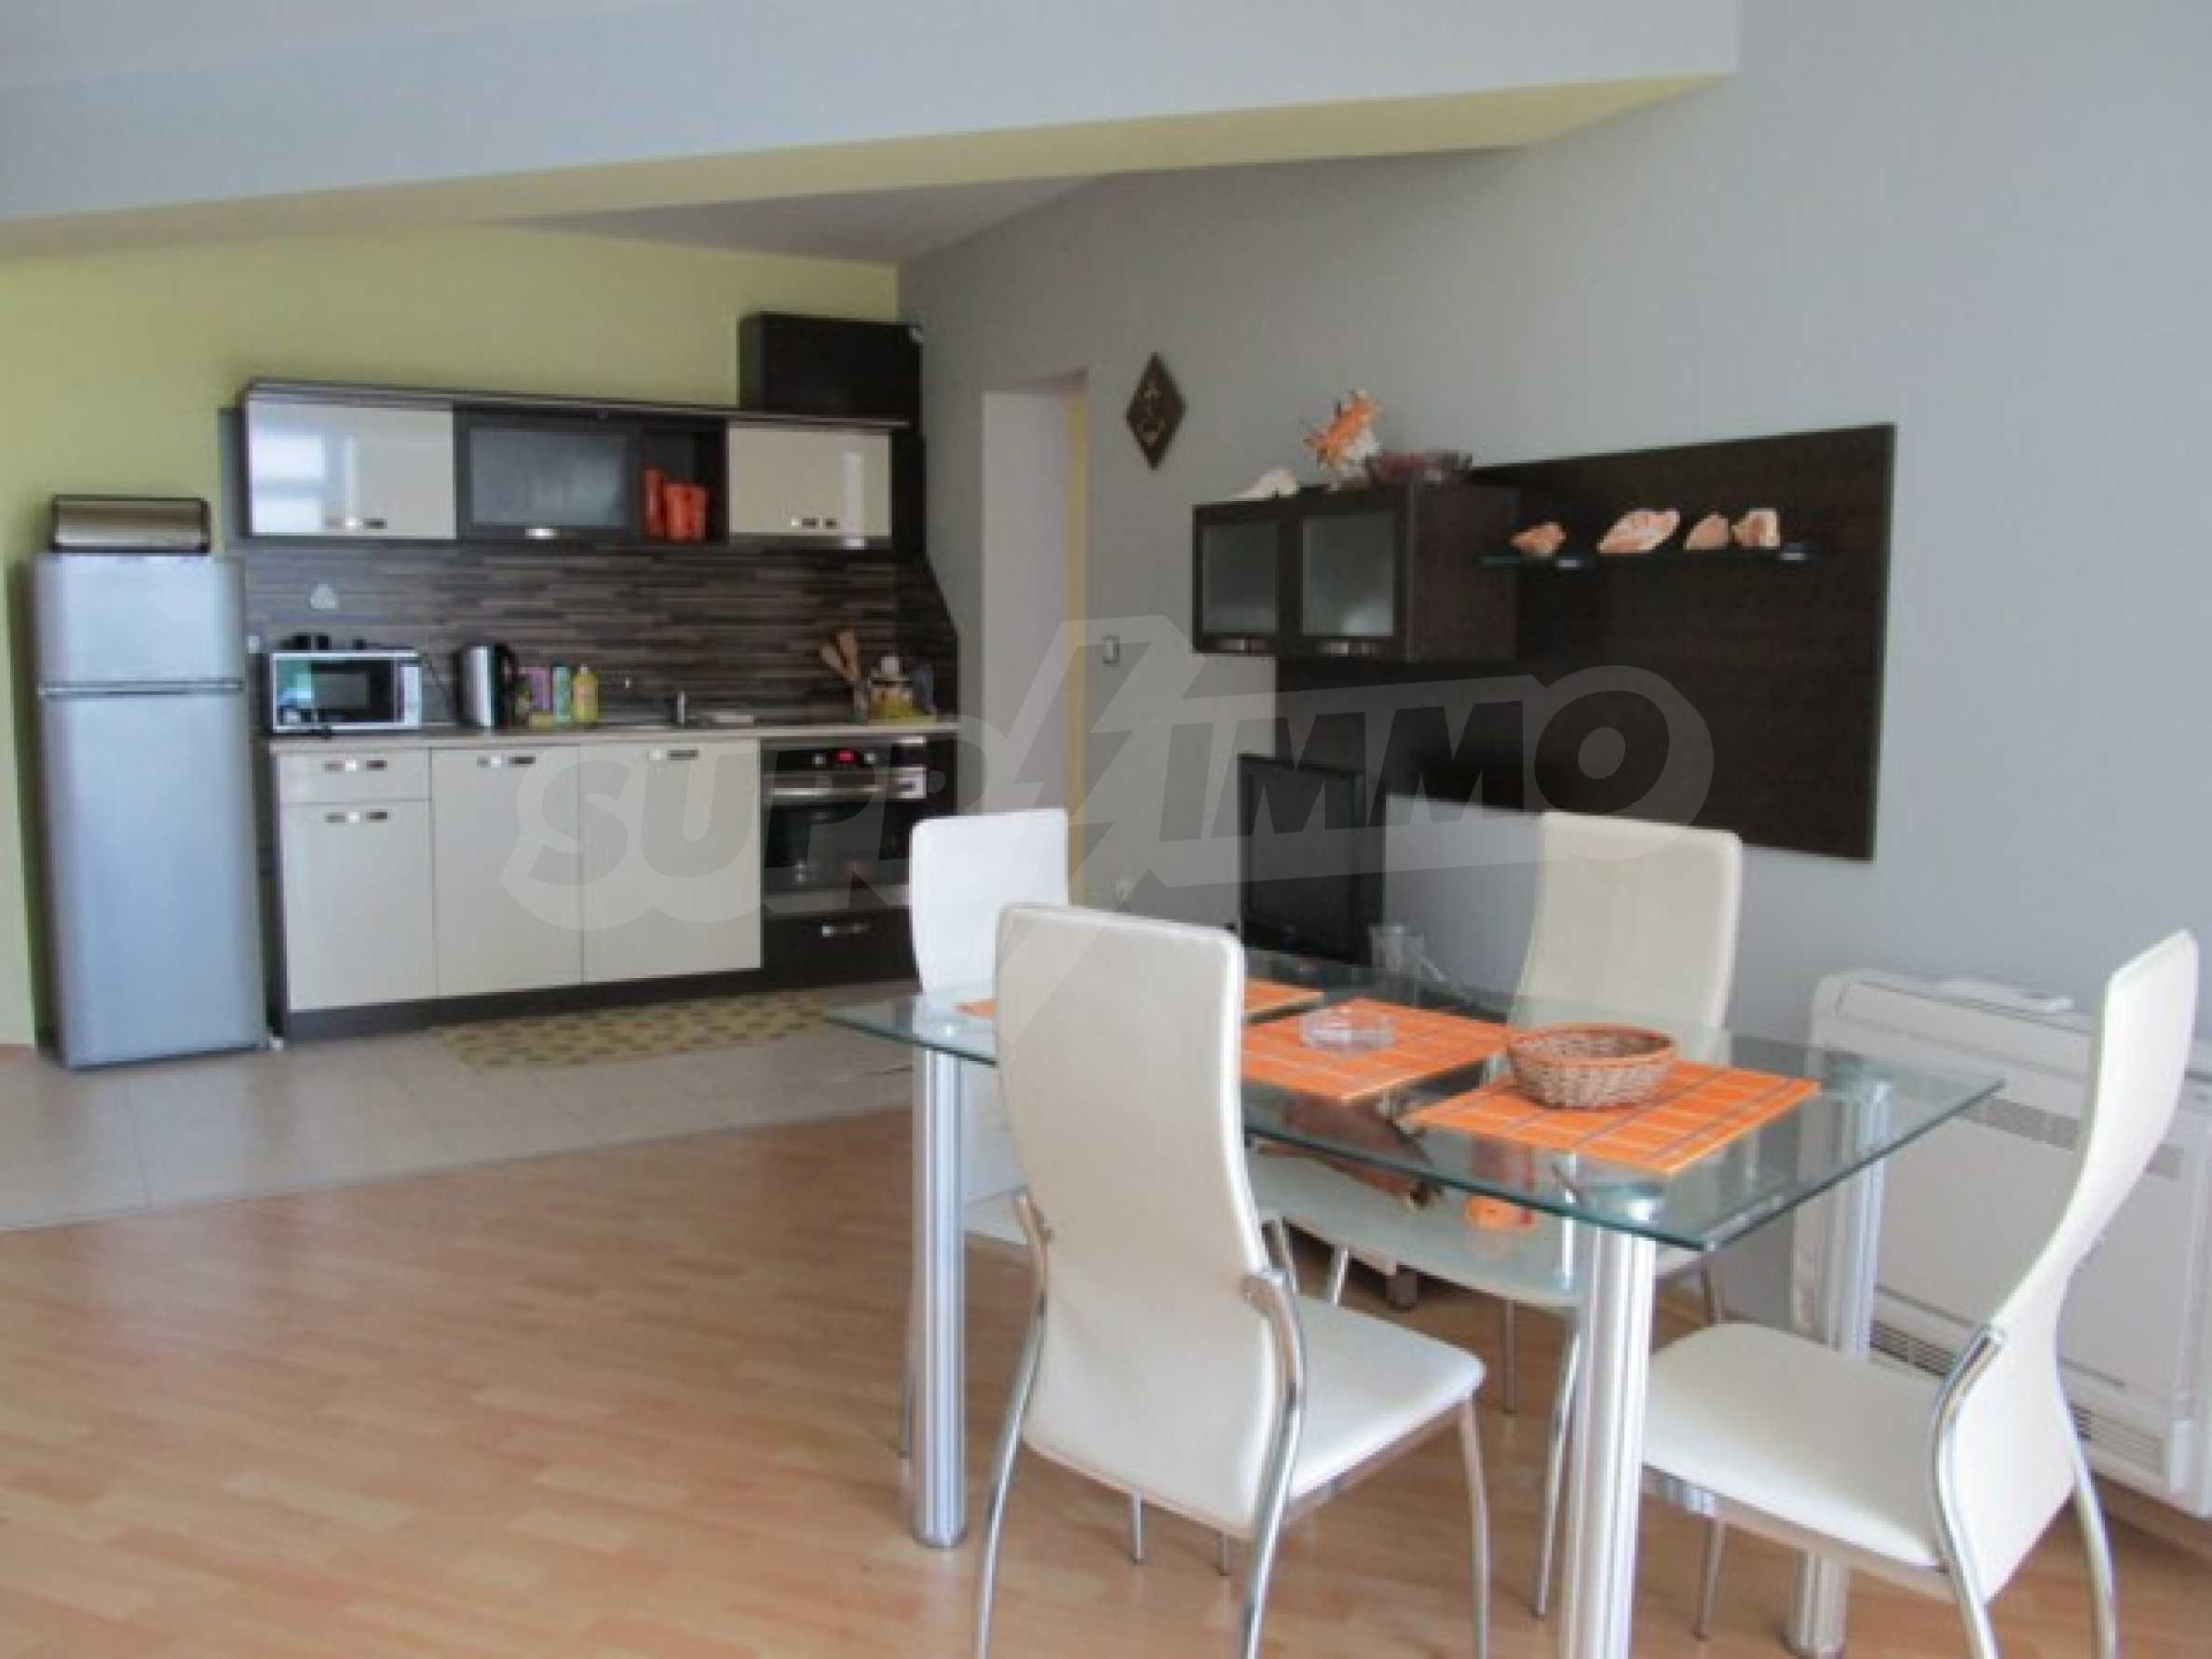 Тристаен апартамент за продажба в Поморие 6